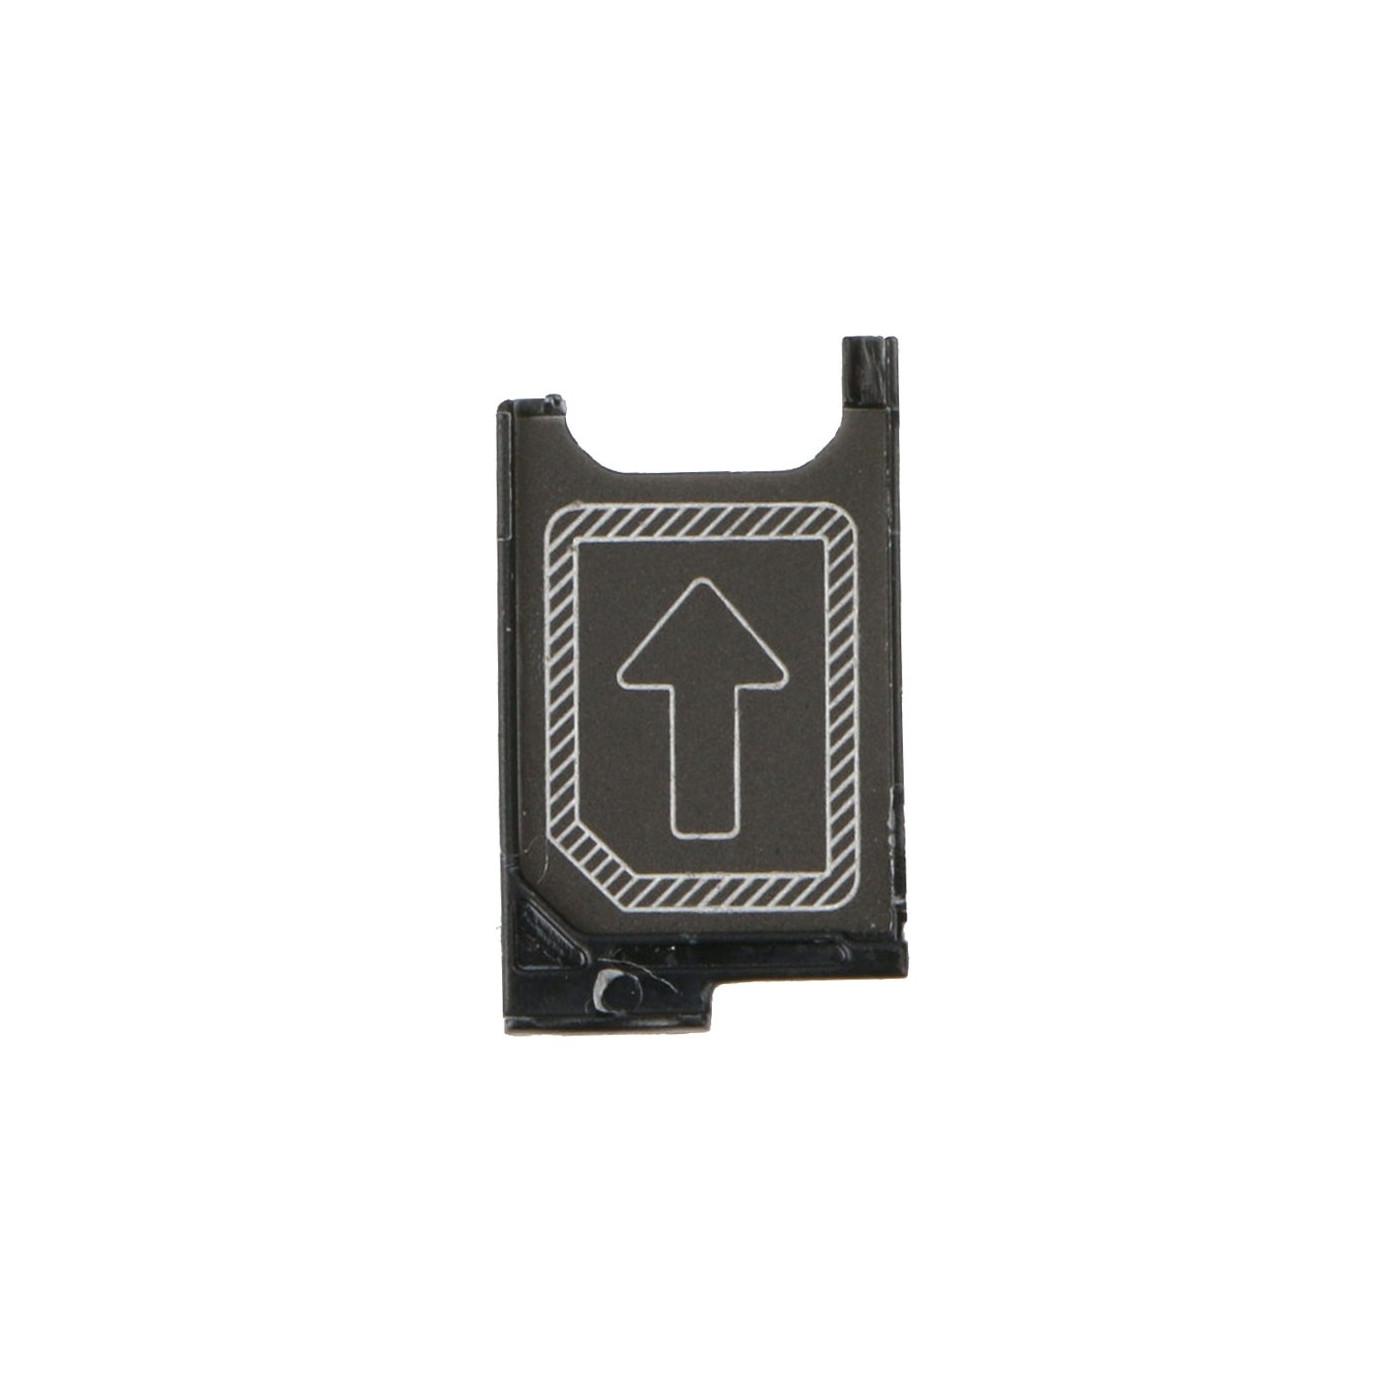 Soporte de tarjeta SIM para ranura de carro de trineo Sony Xperia Z3